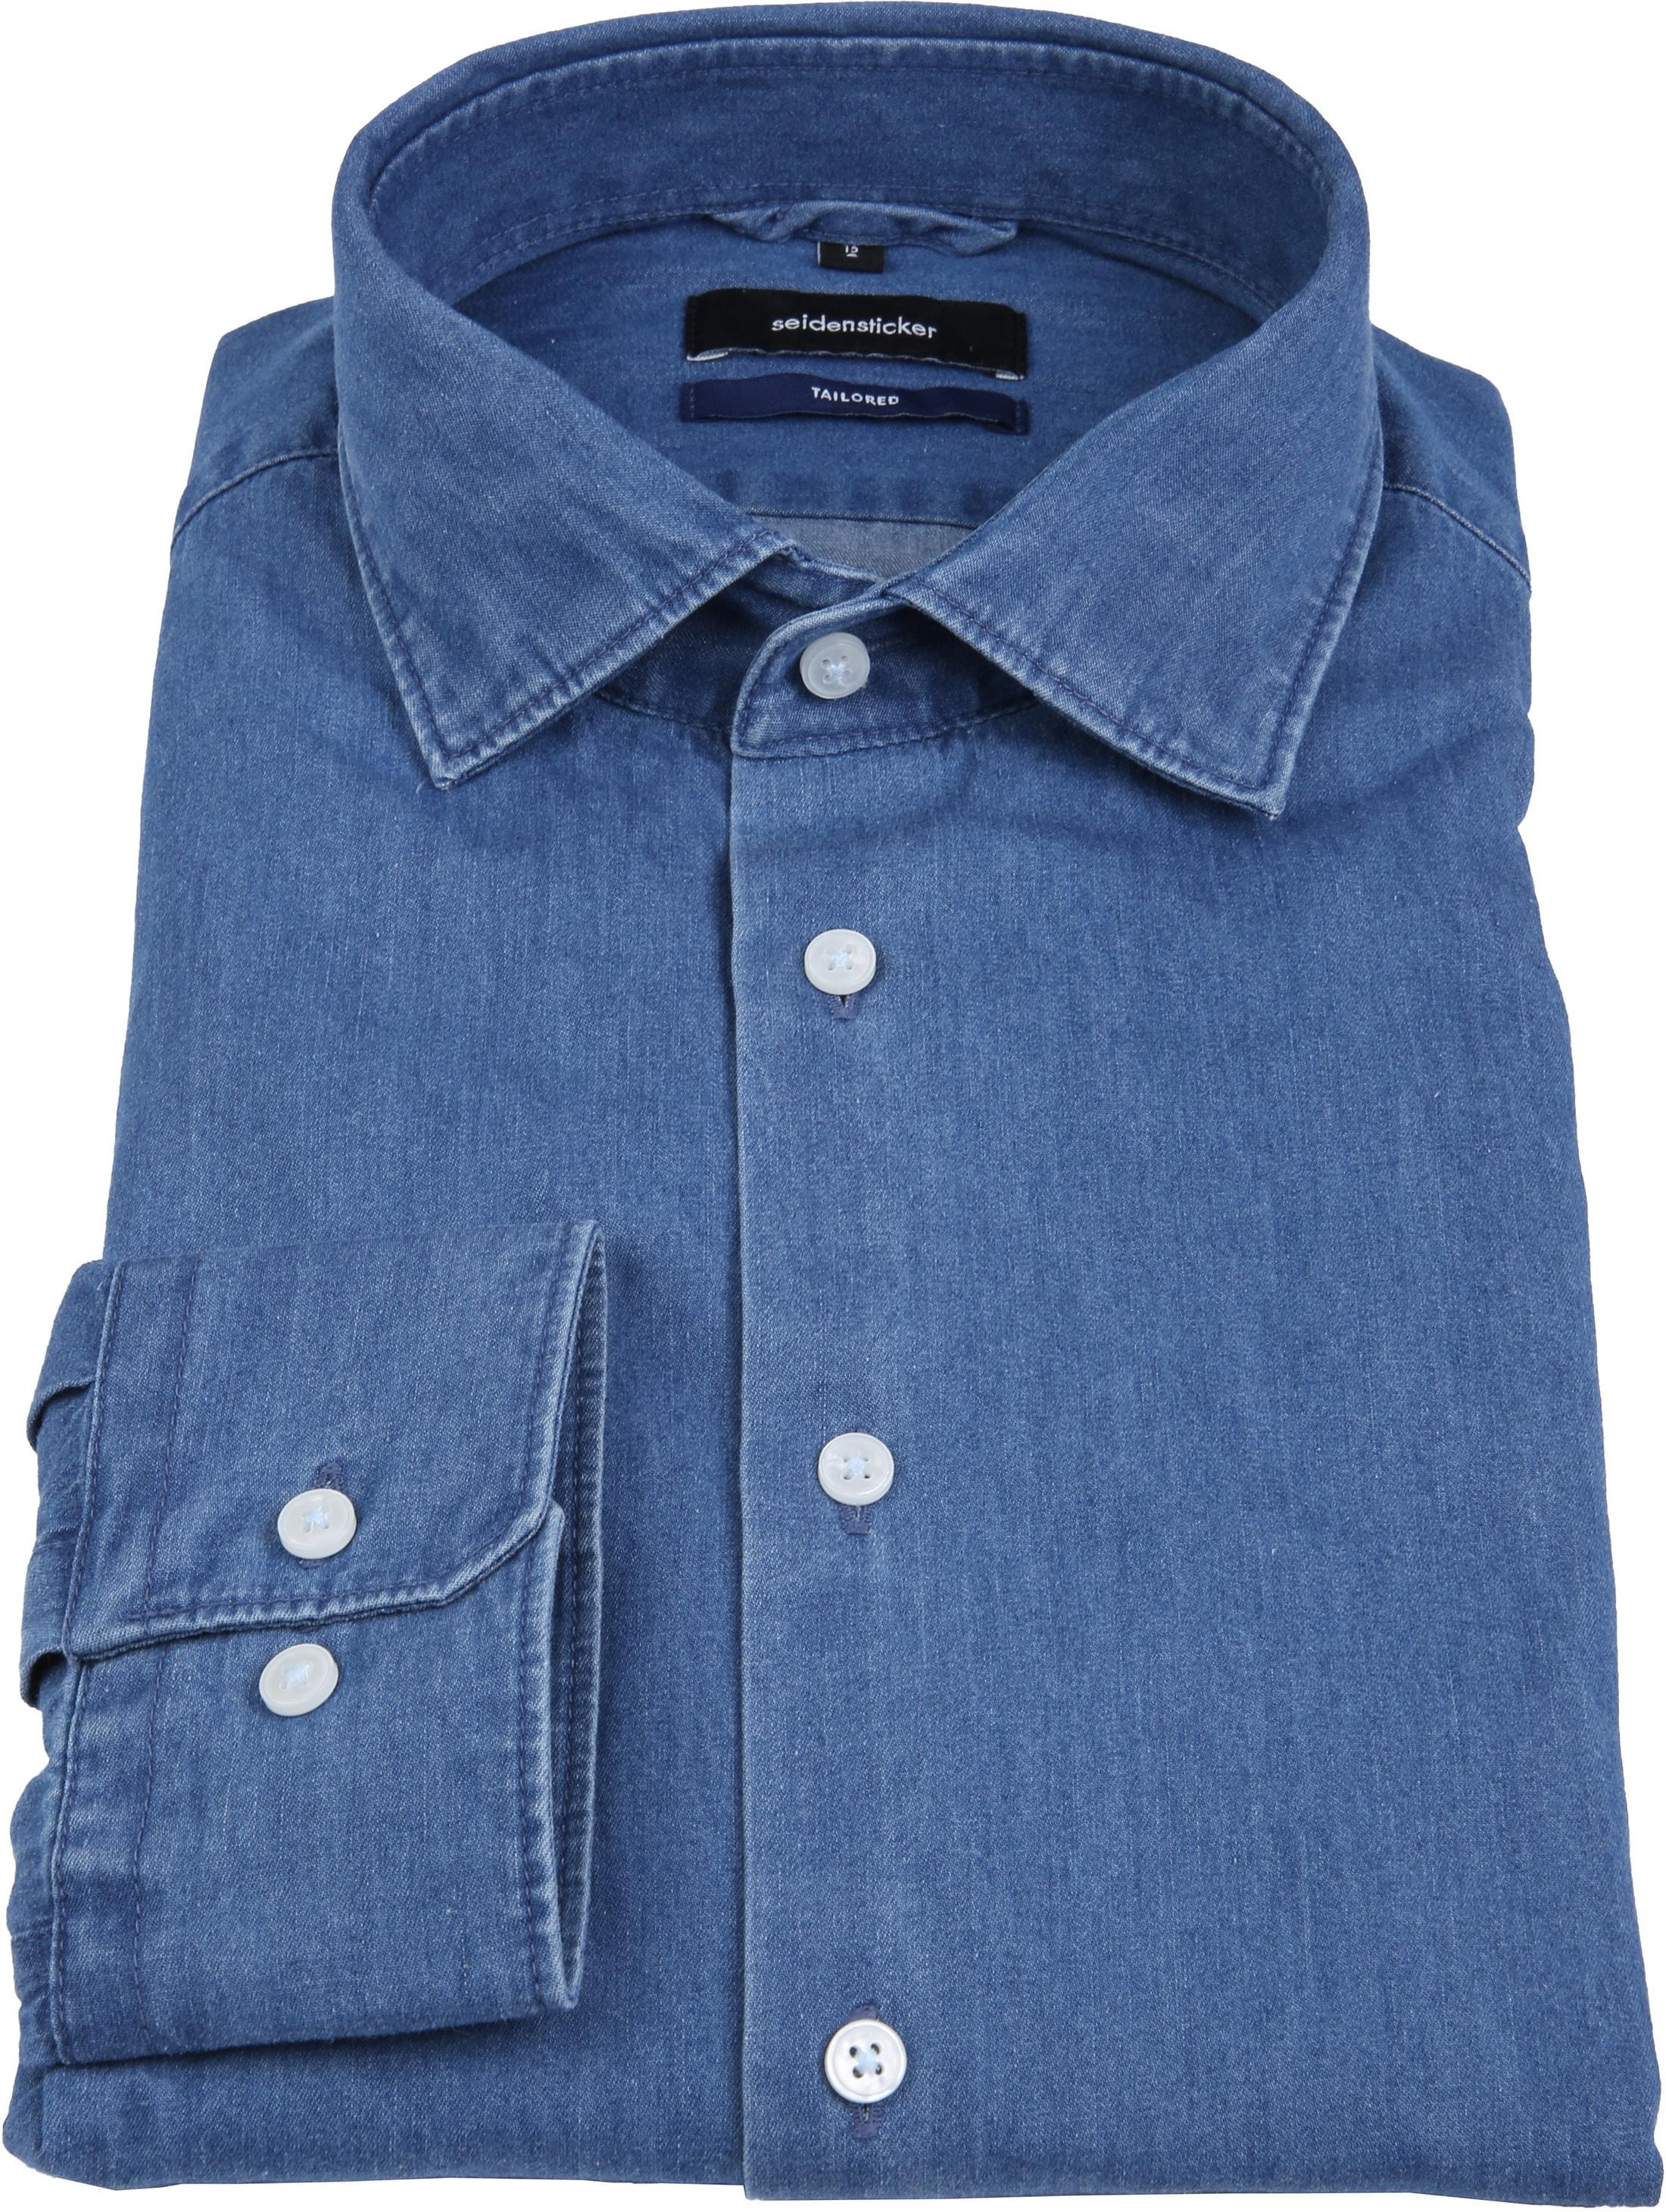 Seidensticker Overhemd TF Denim Blue foto 3